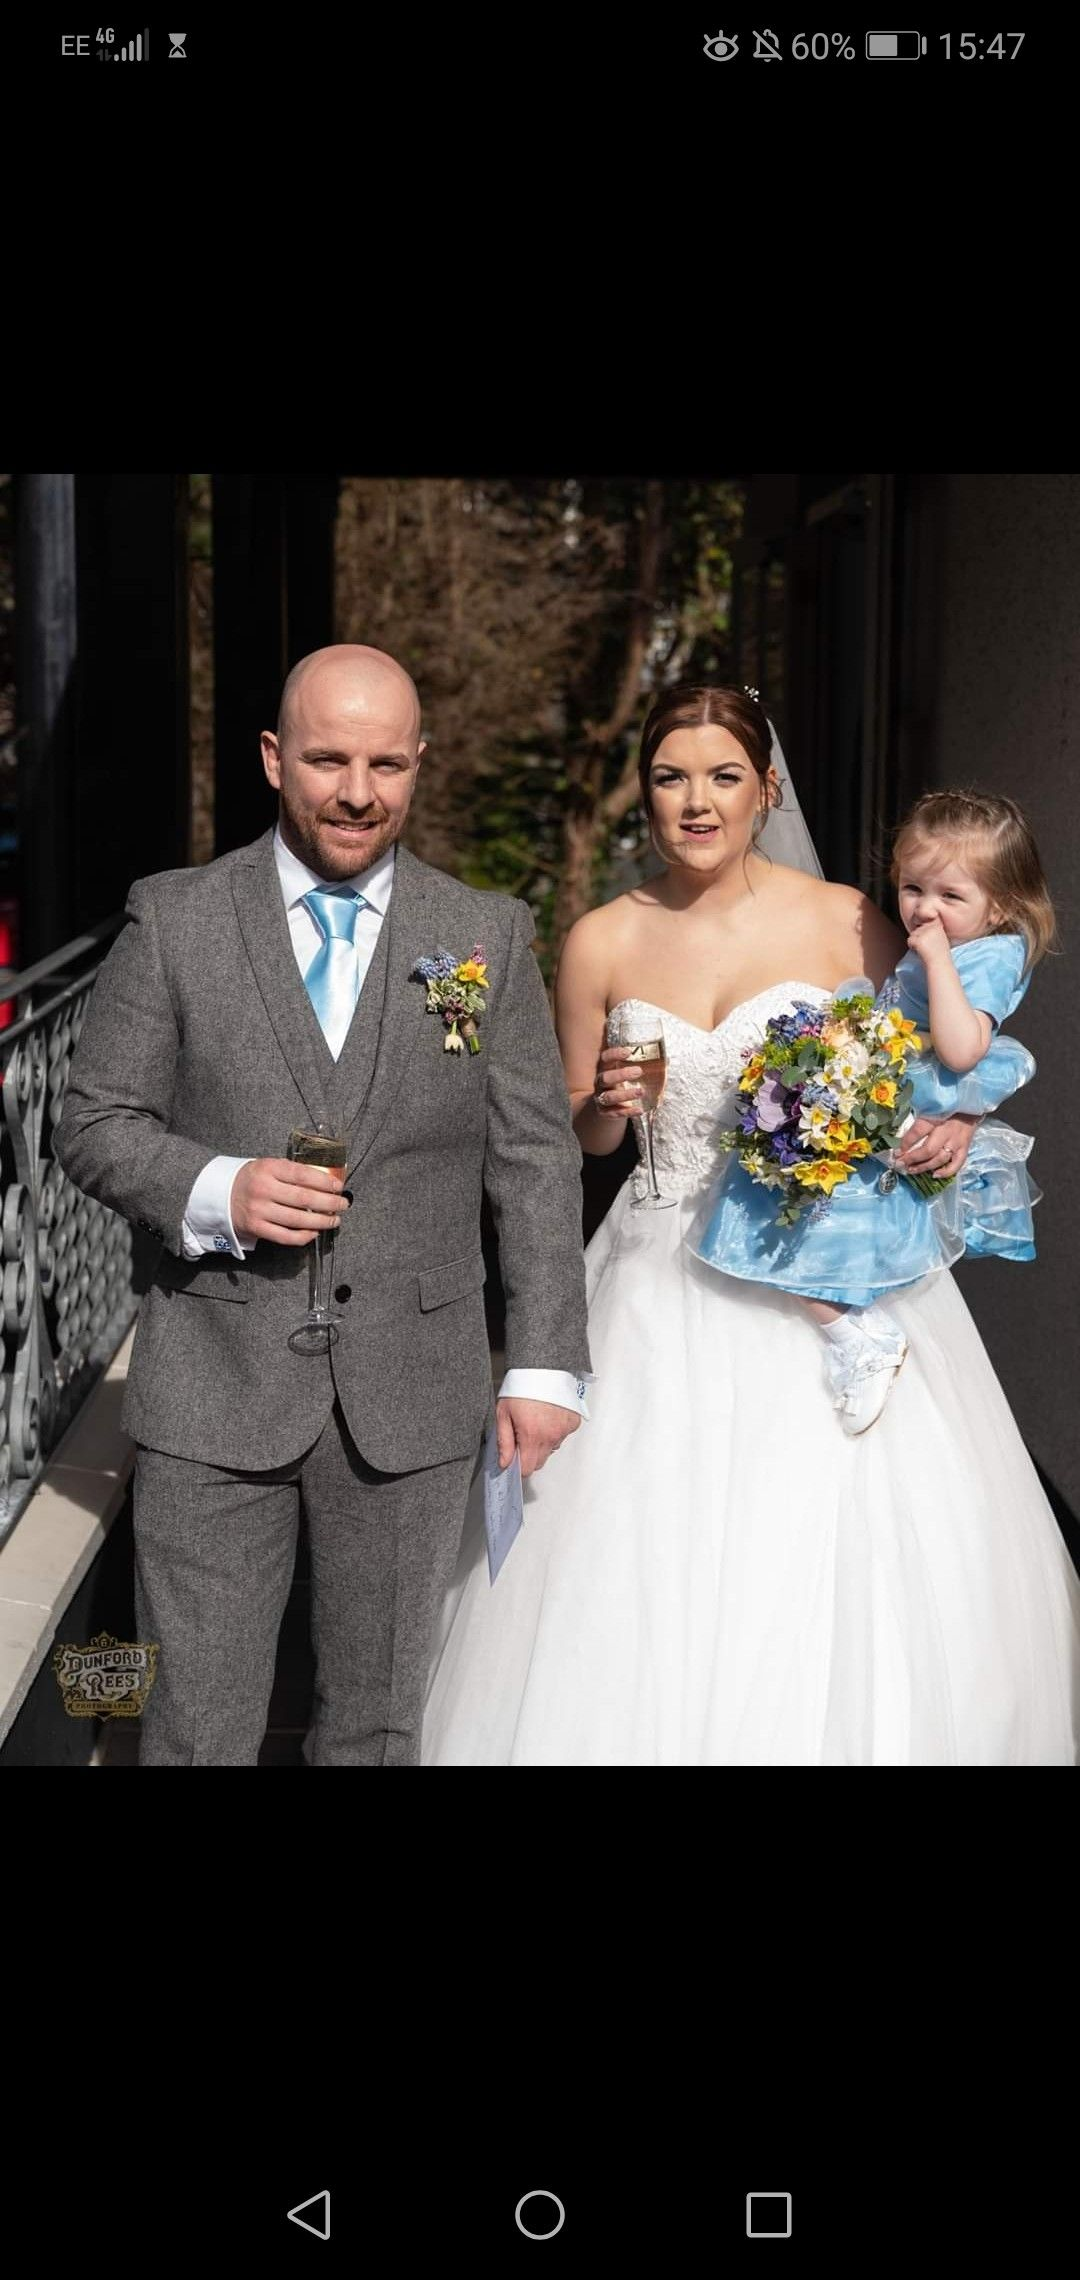 Pin By Steph Morris On Wedding Ideas 2021 Wedding Dresses Dresses Wedding Sneaker [ 2280 x 1080 Pixel ]